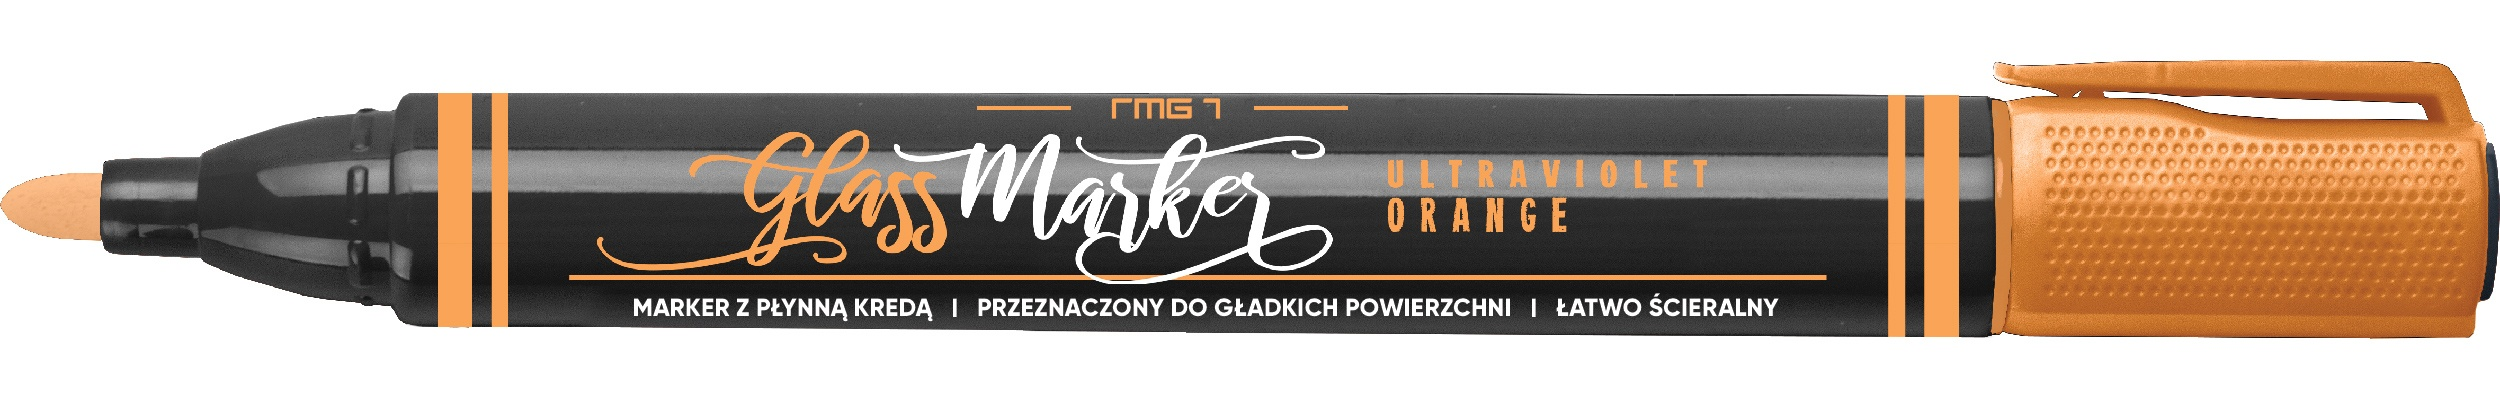 RMG-1 Glass Marker